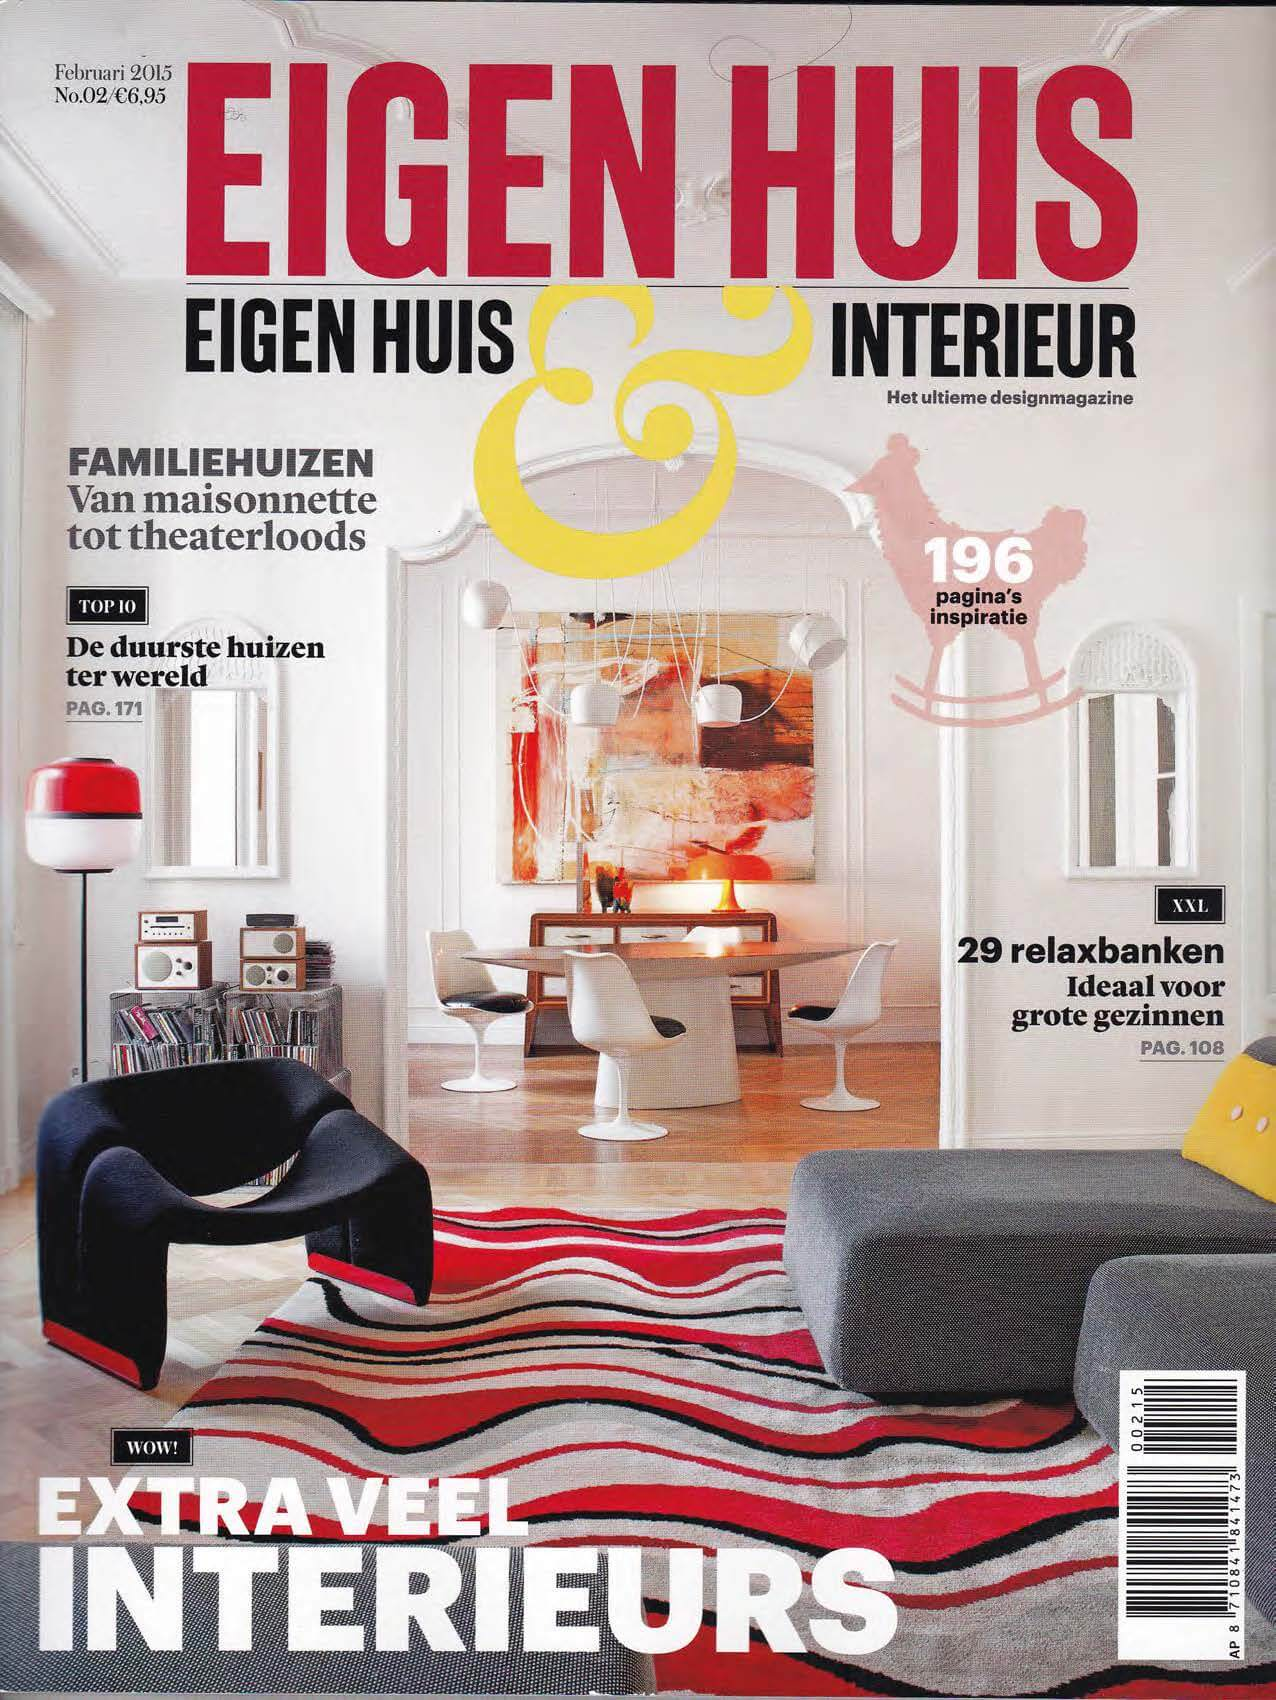 Suite wood eigen huis interieur feb 2015 for Eigen huis en interieur